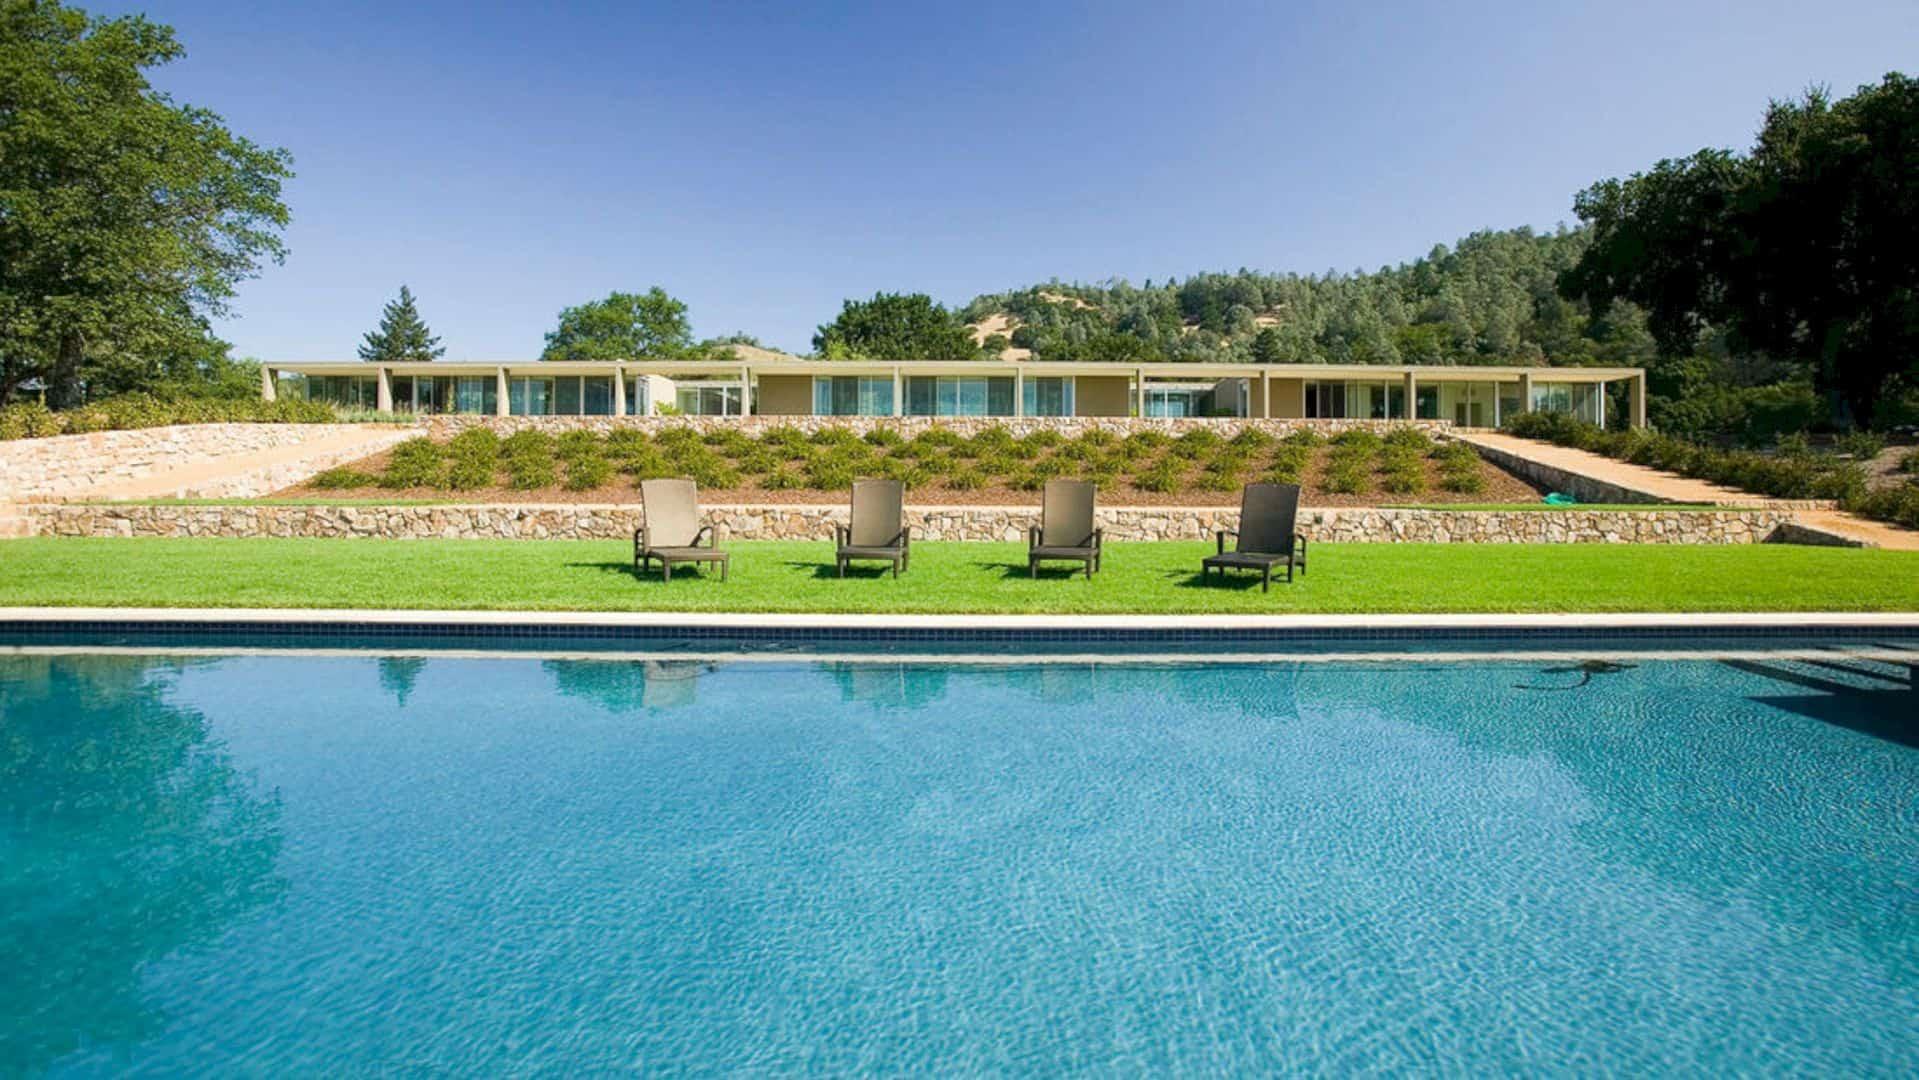 Zakin Residence: A Minimalist Napa Valley Estate with Landscape Development